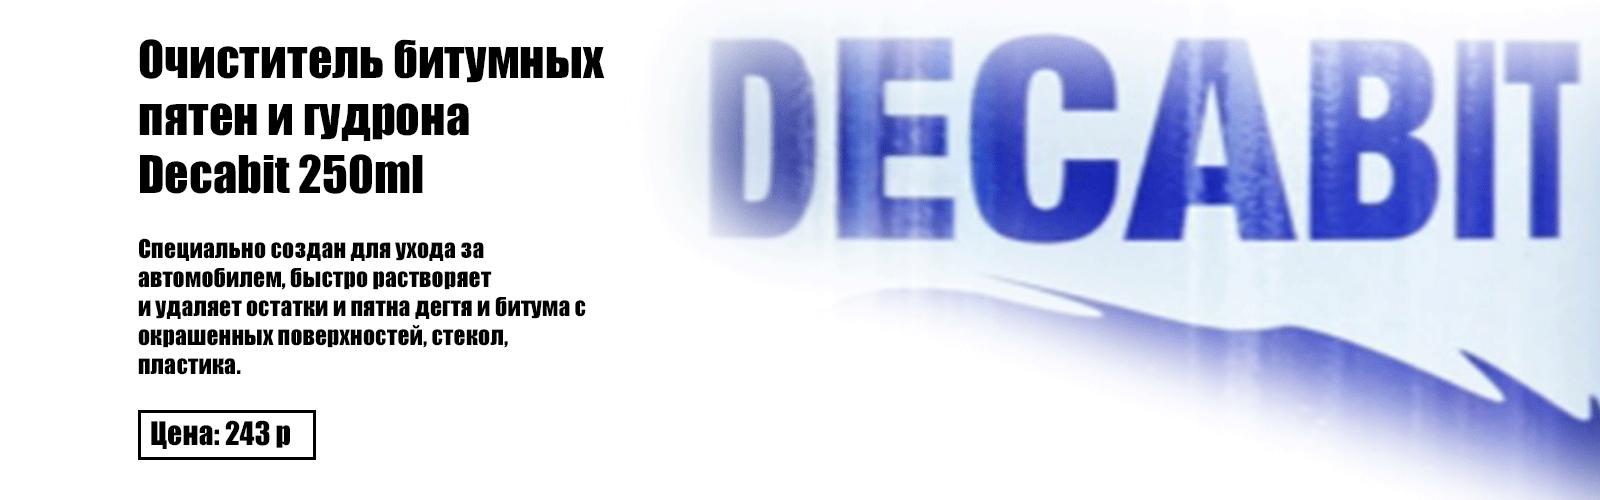 dekabit12